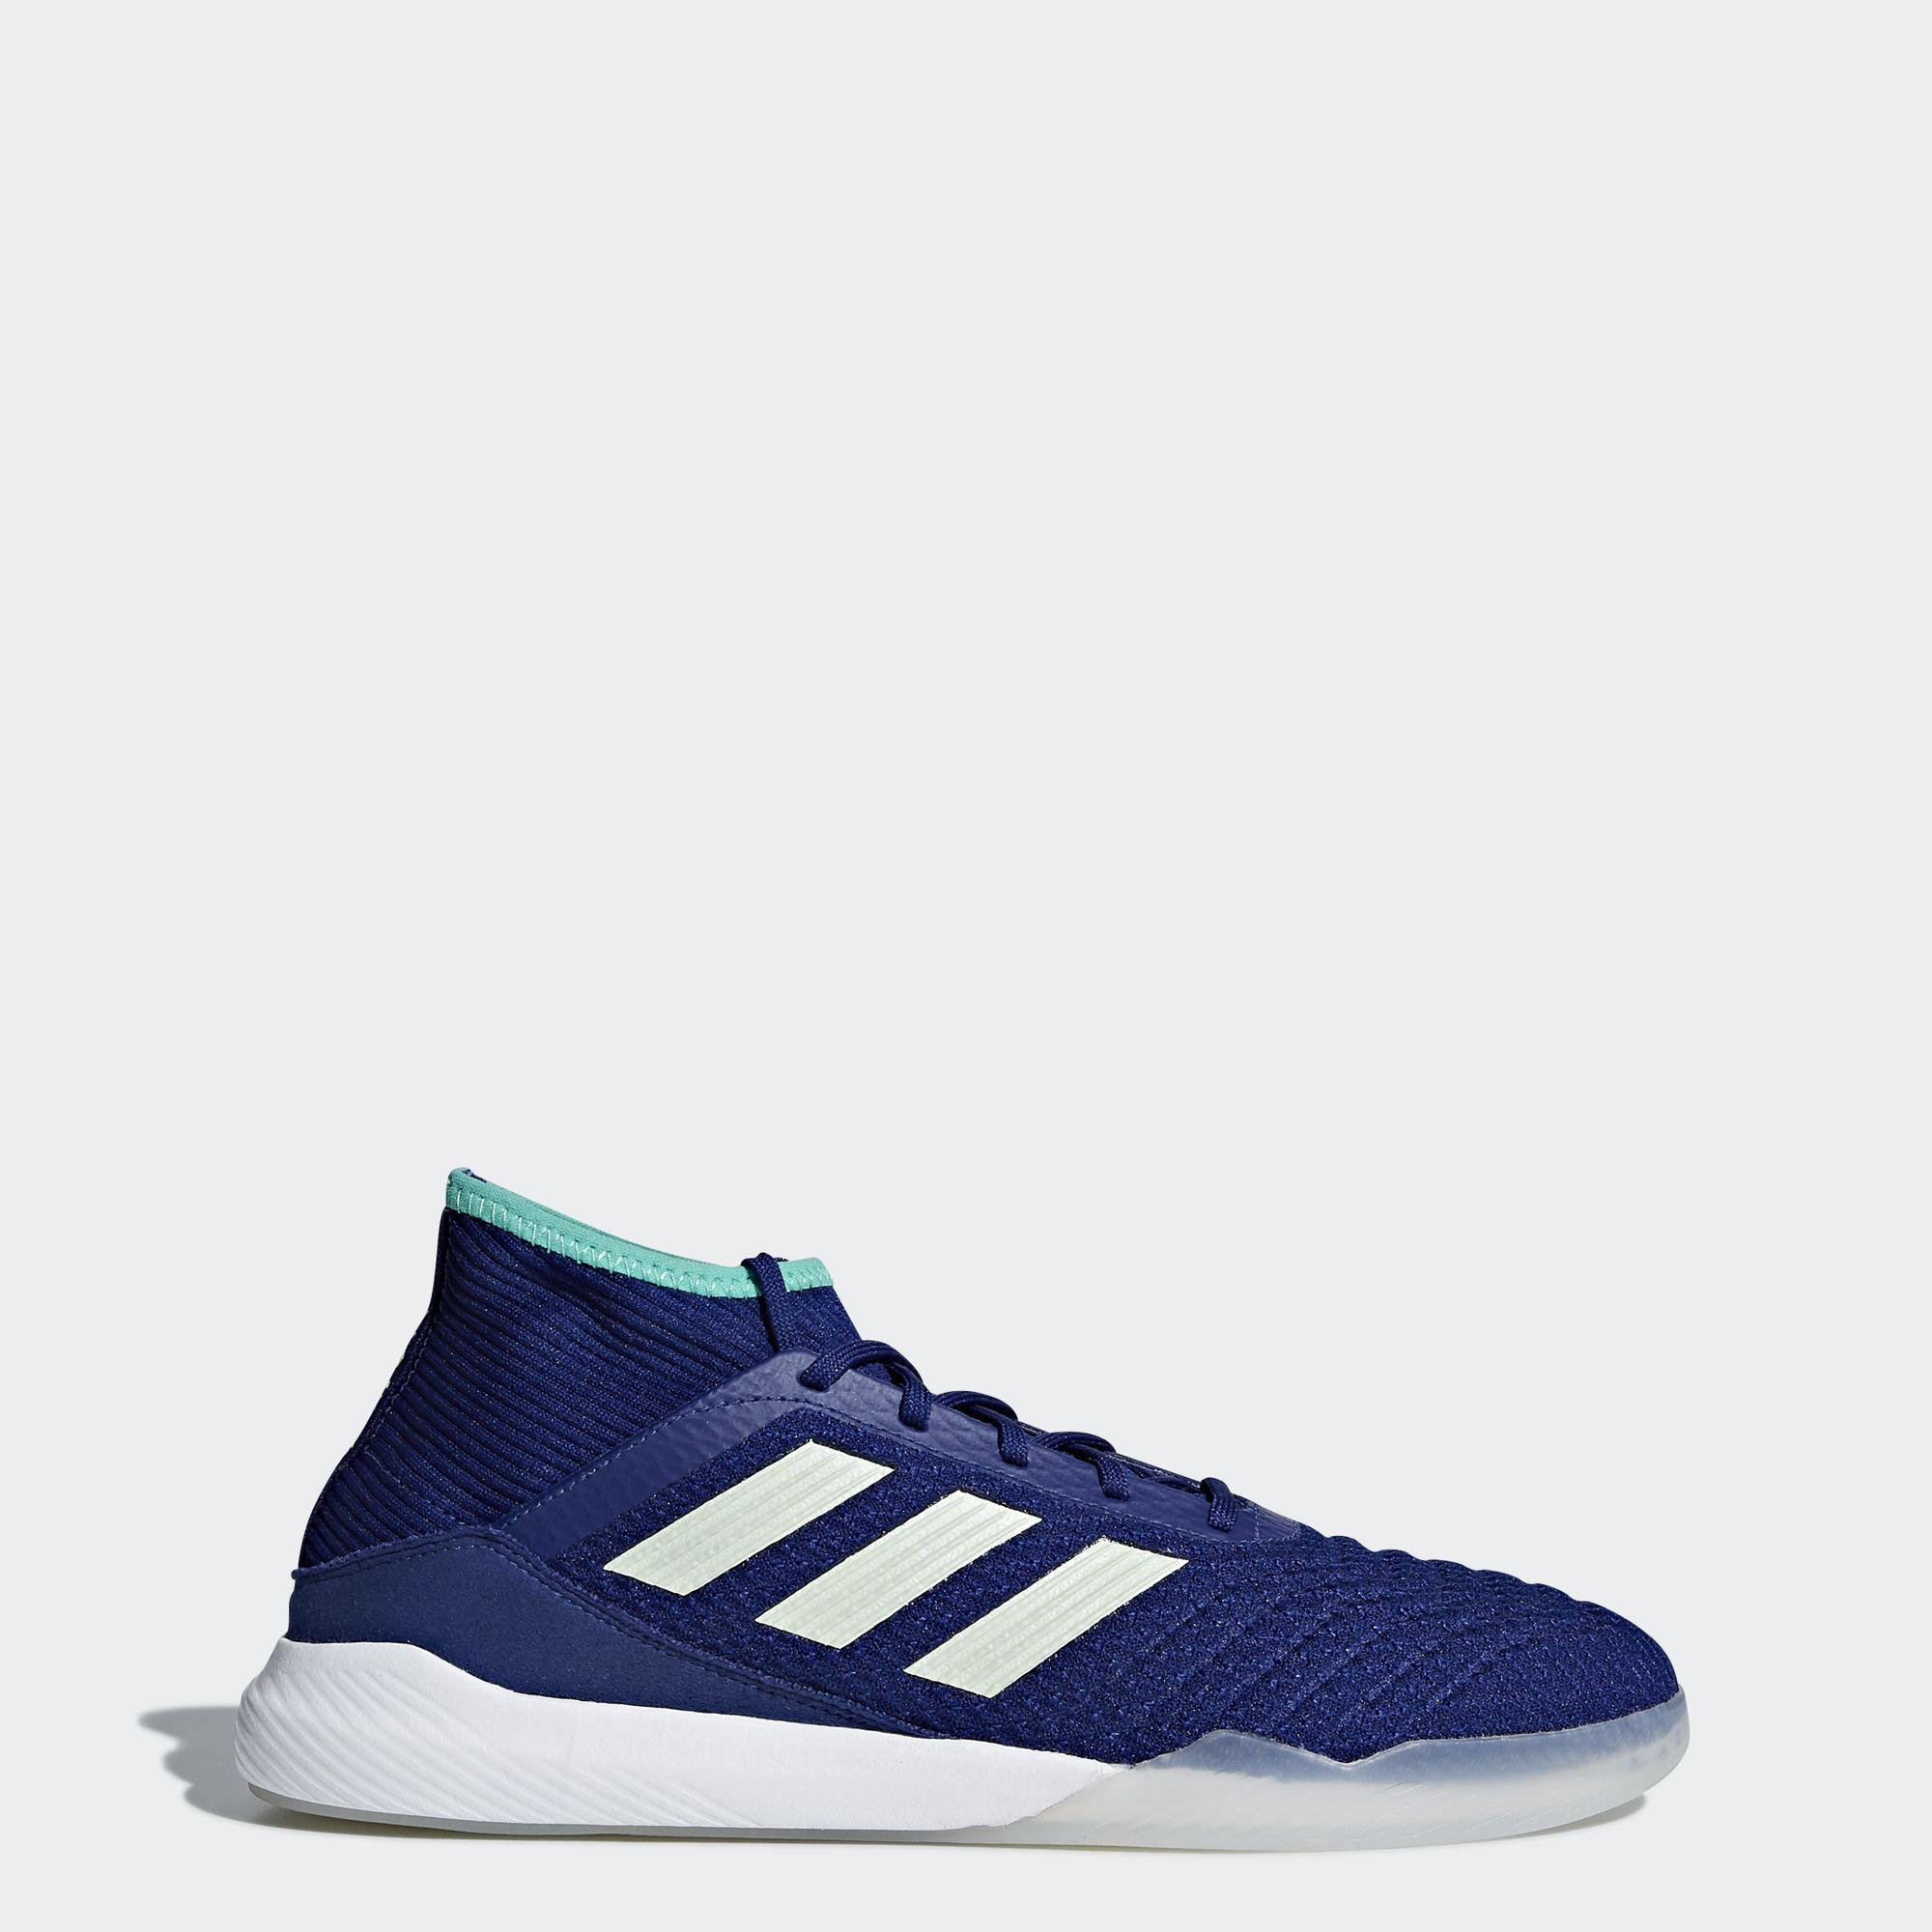 Футбольная обувь Predator Tango 18.3 adidas Performance Unity Ink/Aero Green/Ftwr White